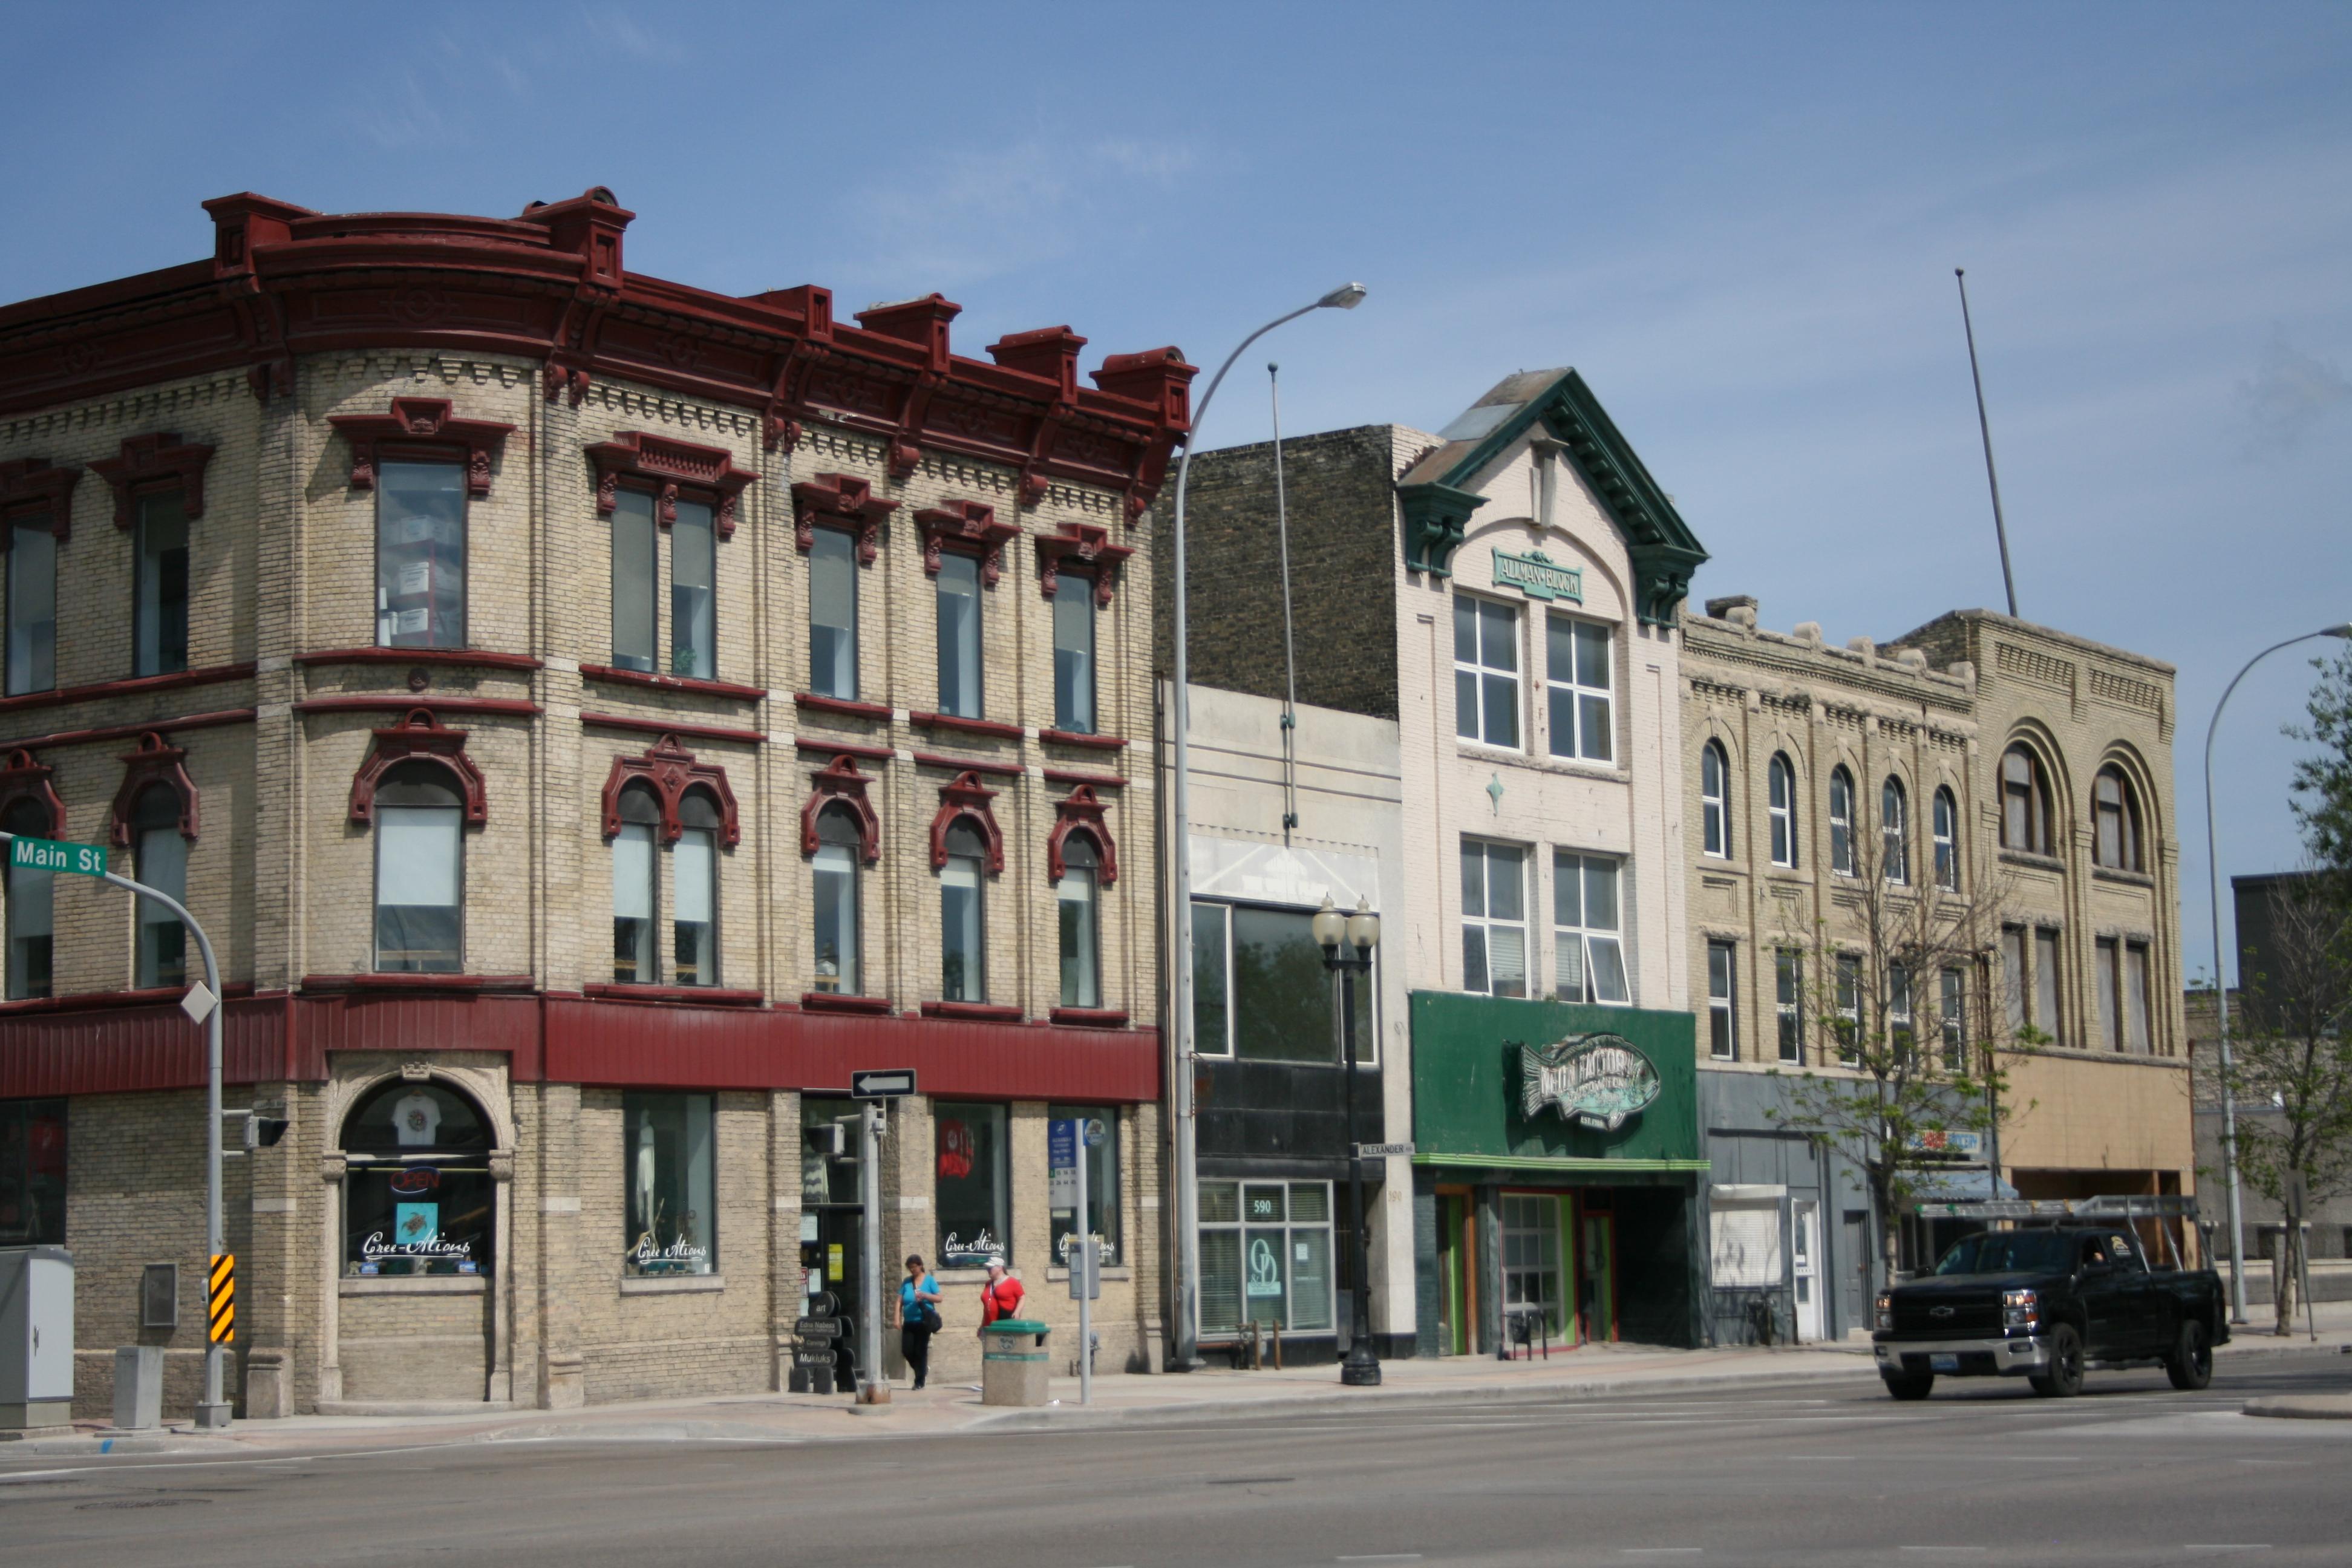 600 Main Street